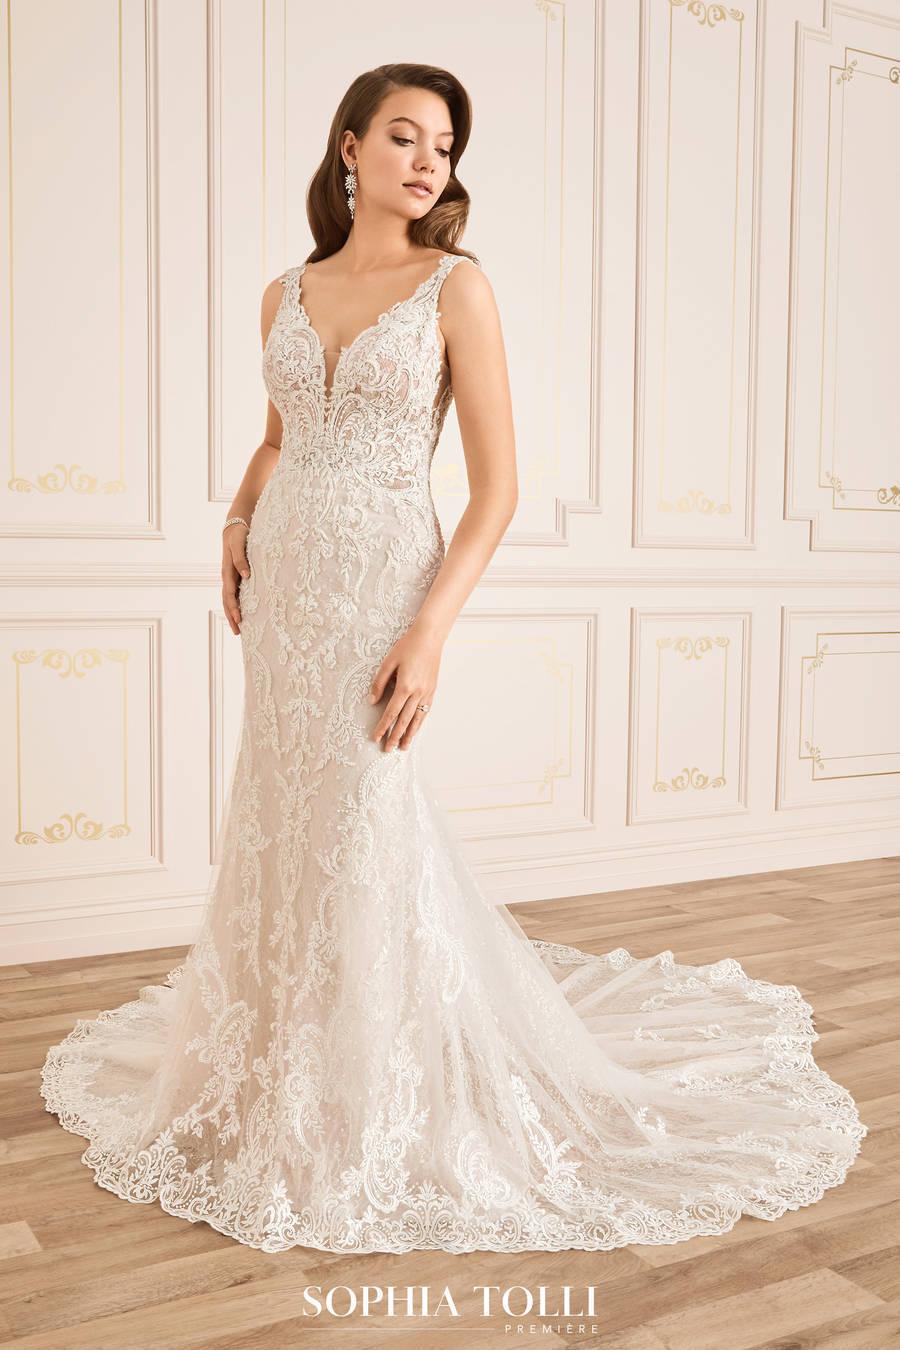 Mon Cheri Style Y12018 wedding dress